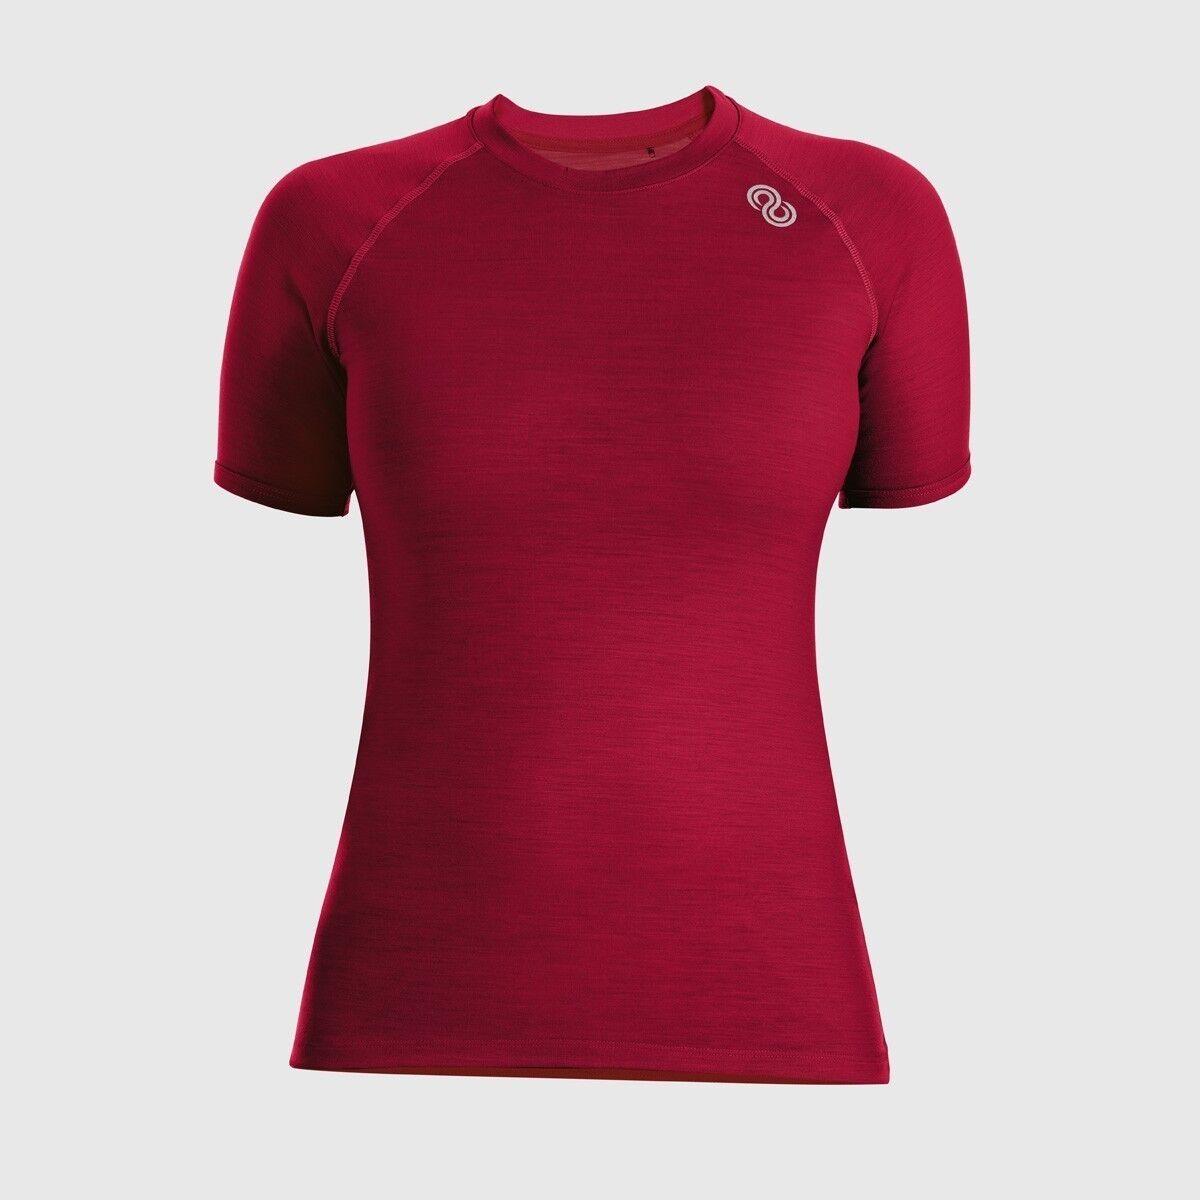 rojoa rewoolution ali-mujer 's t-shirt SS 140, ropa interior, lana merino, Ruby